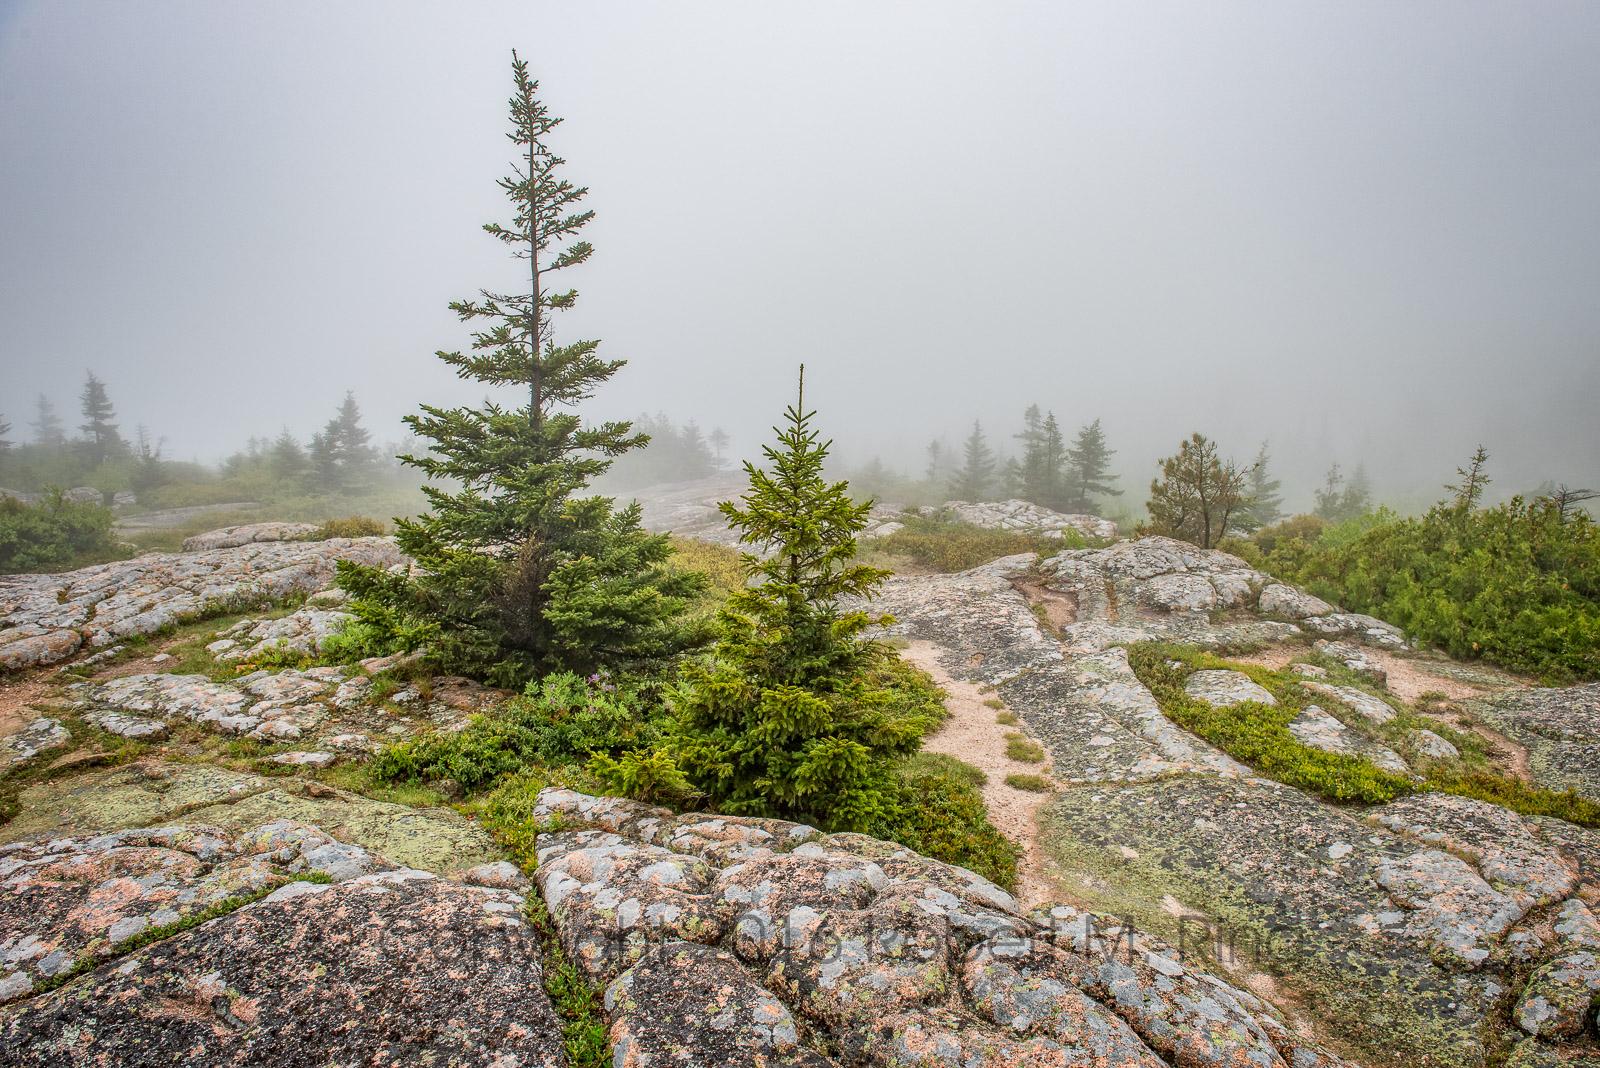 Acadia, Cadillac Mountain, New England, Fog, scenic, pine tree,